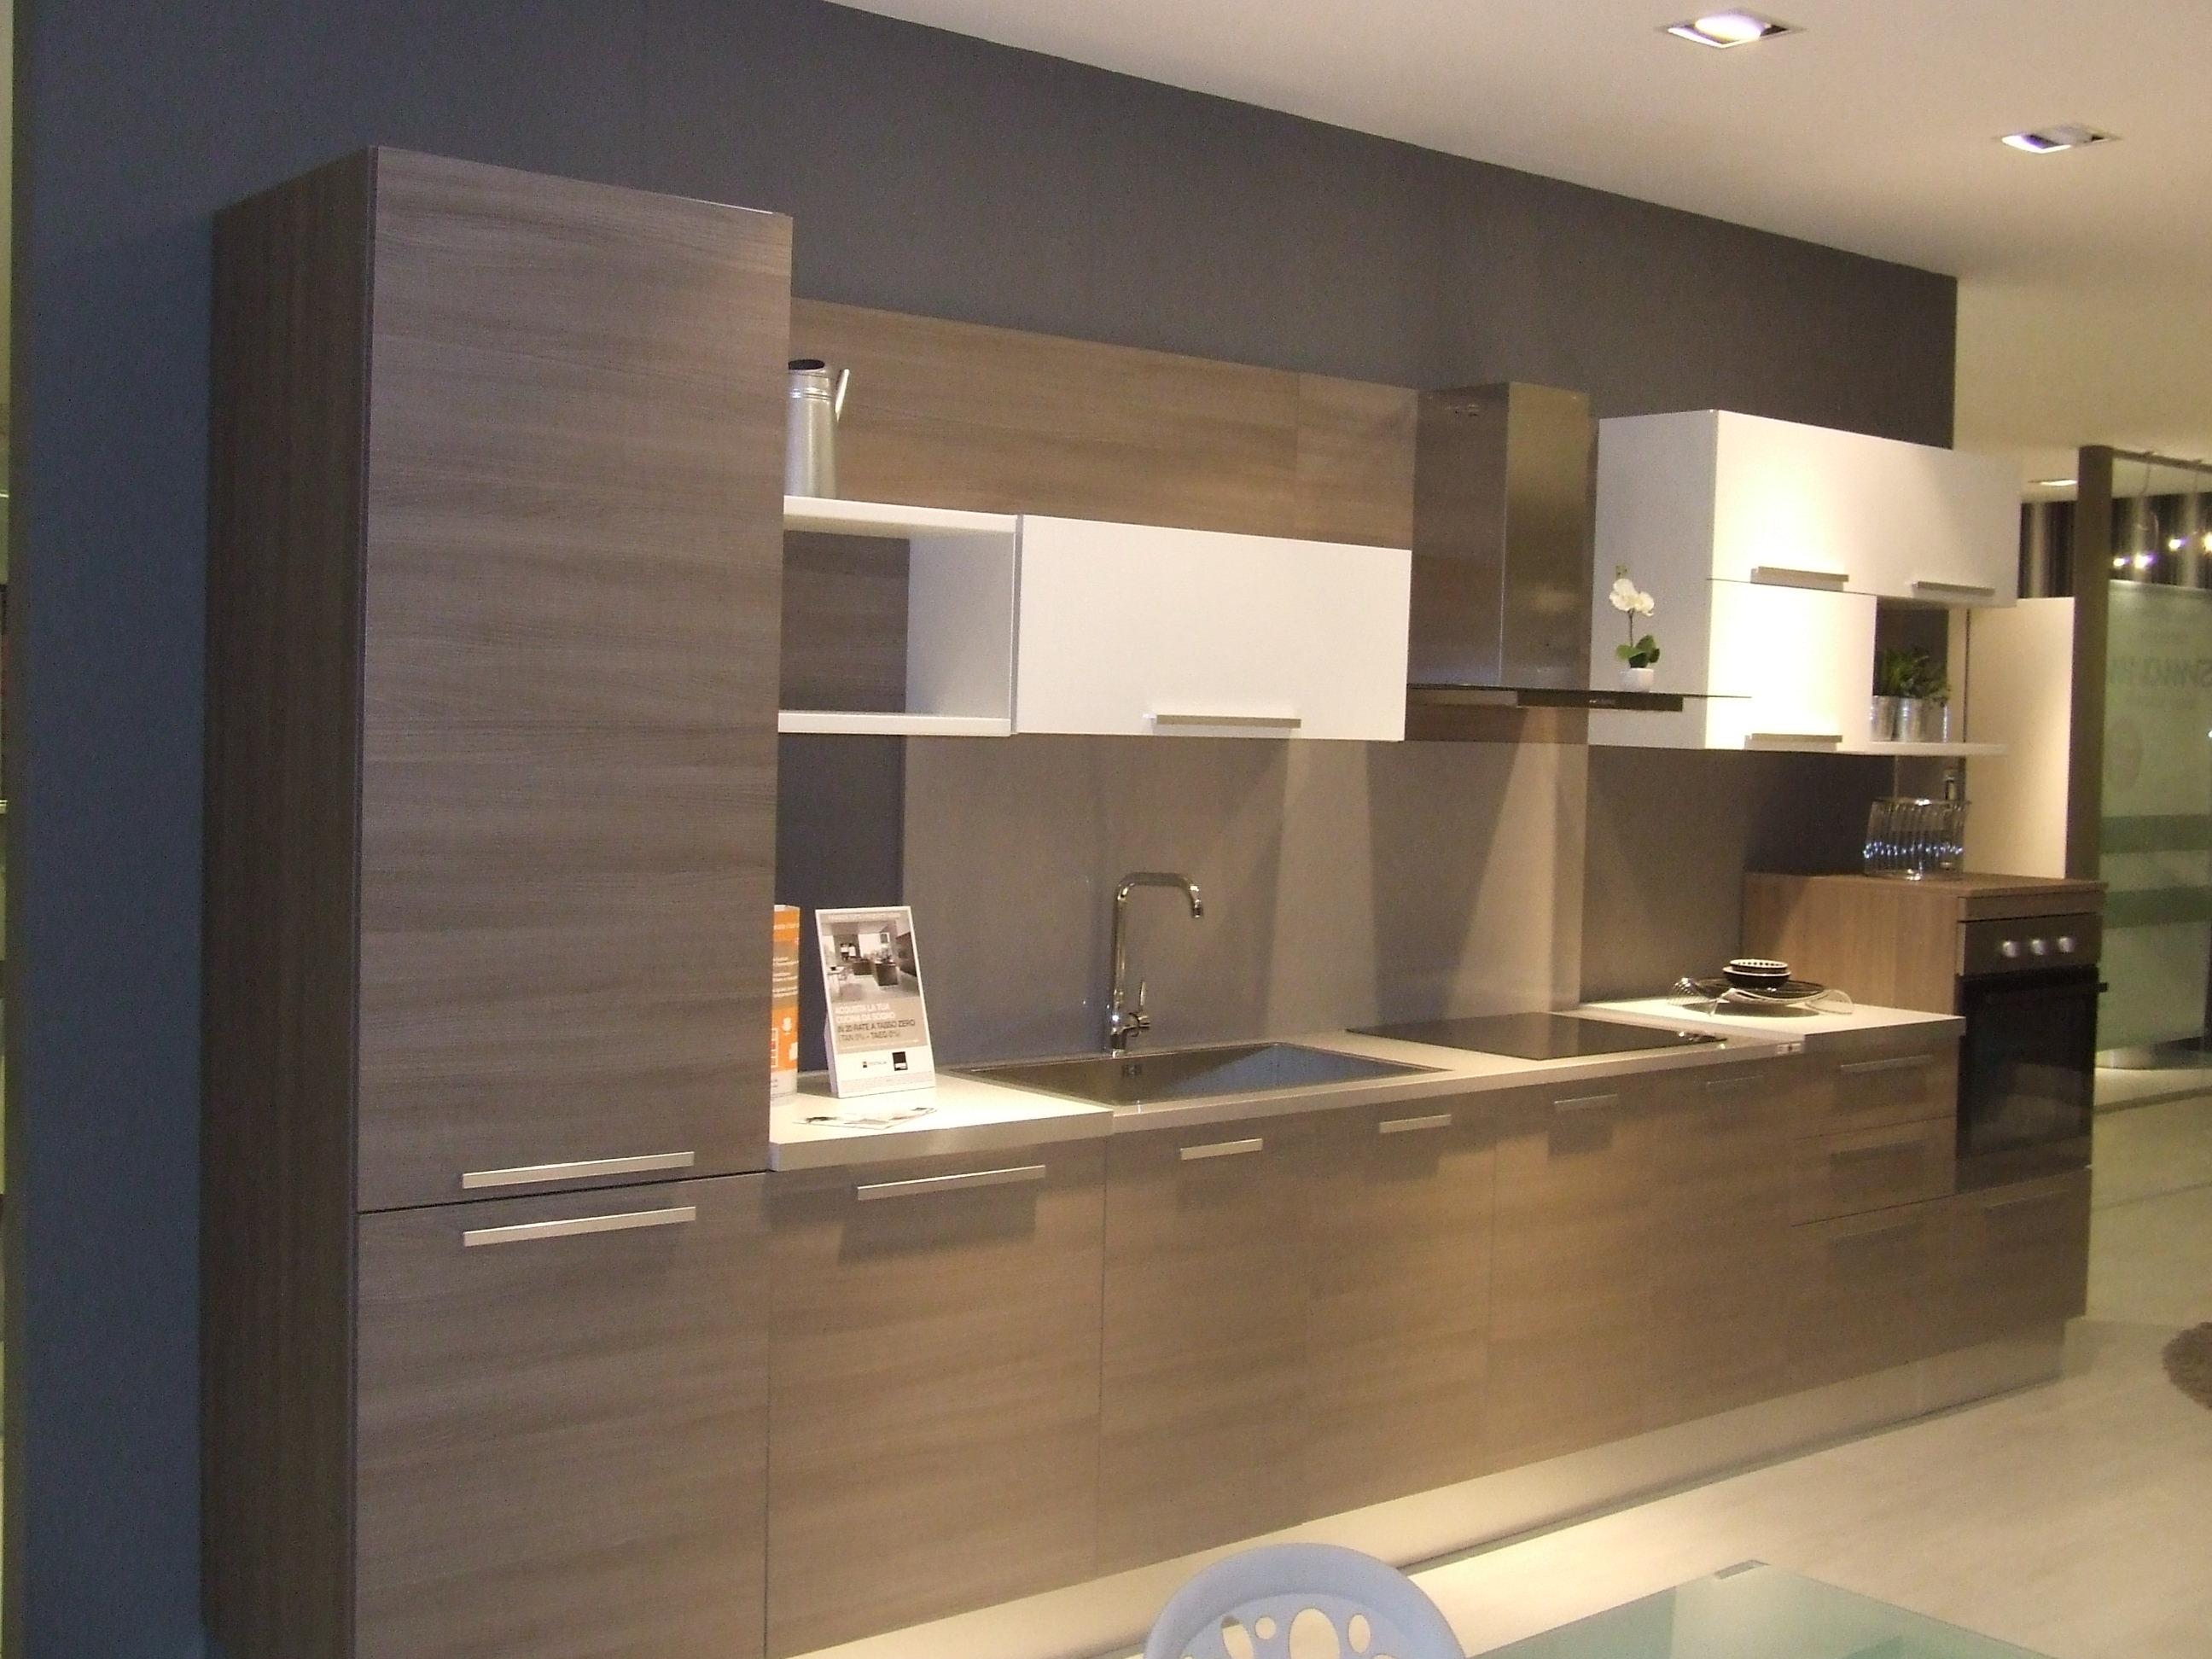 Cucina aran modello mia cucine a prezzi scontati - Aran cucine outlet ...